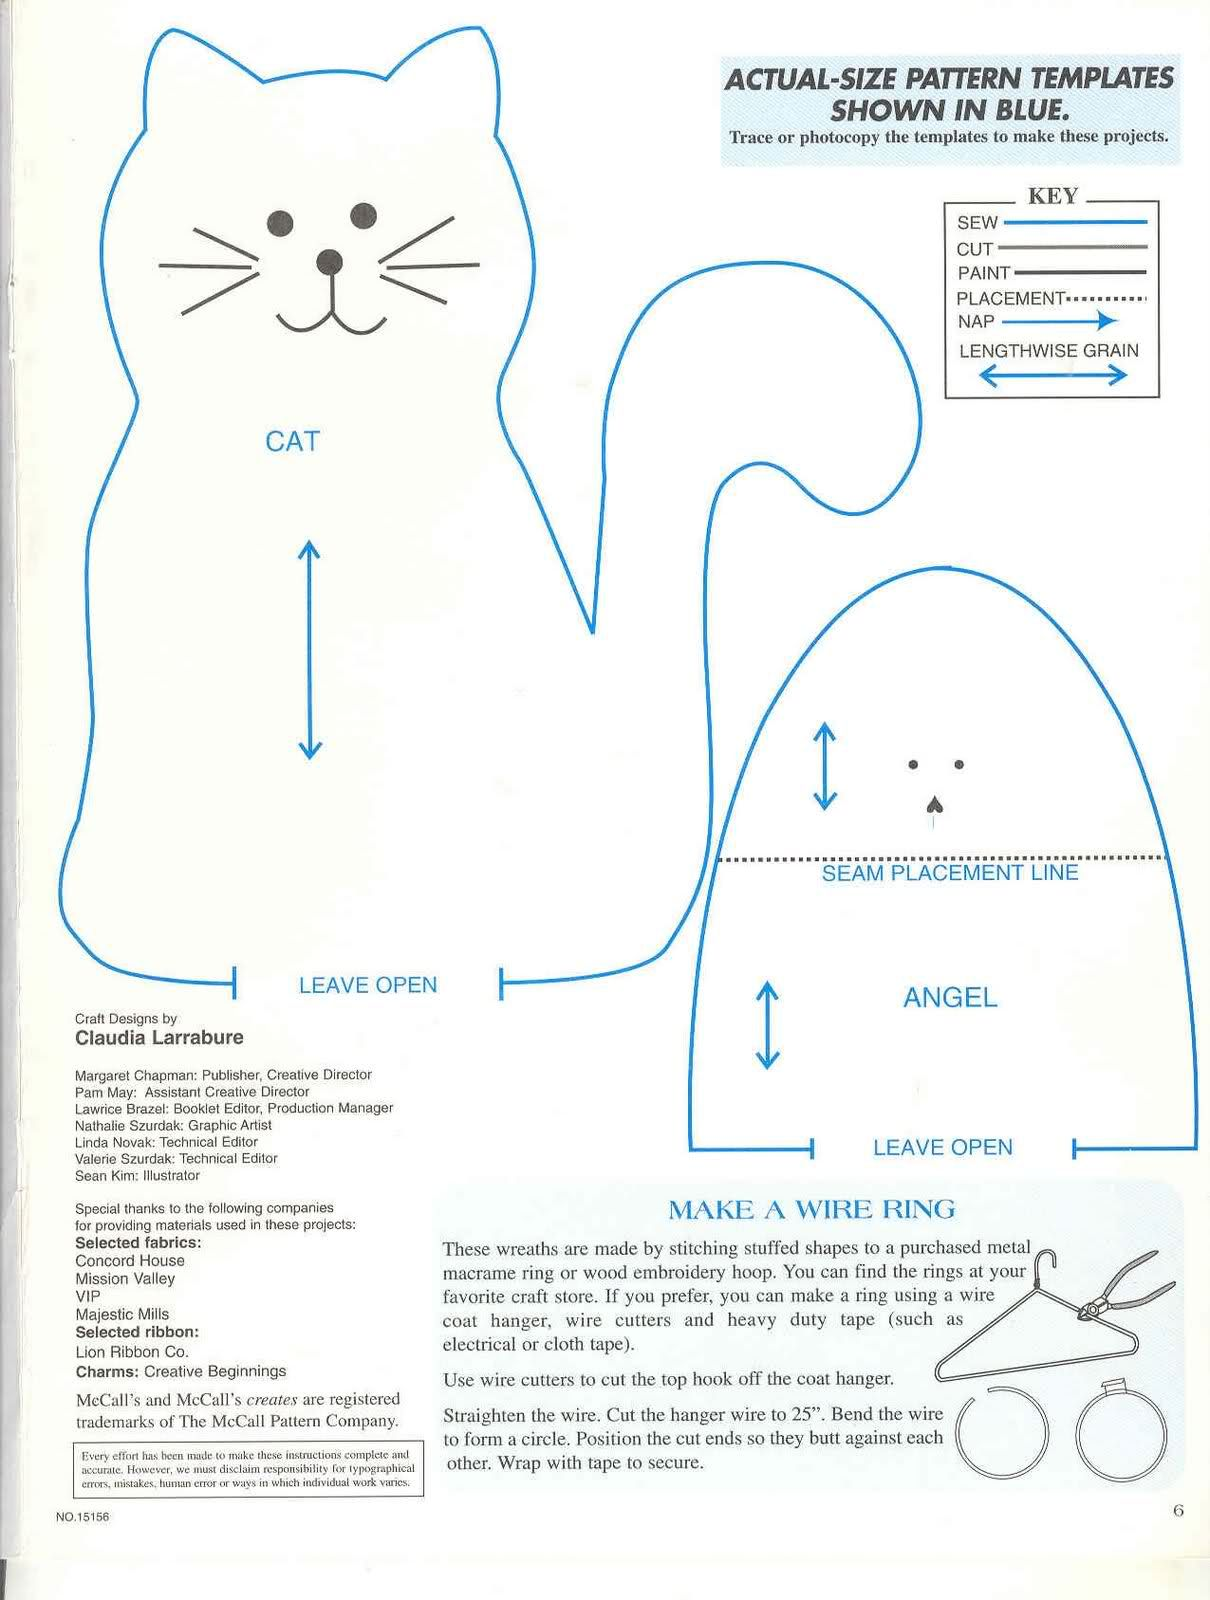 FORO DE PATCHWORK - Página 2296 | Gatos | Pinterest | Moldes ...